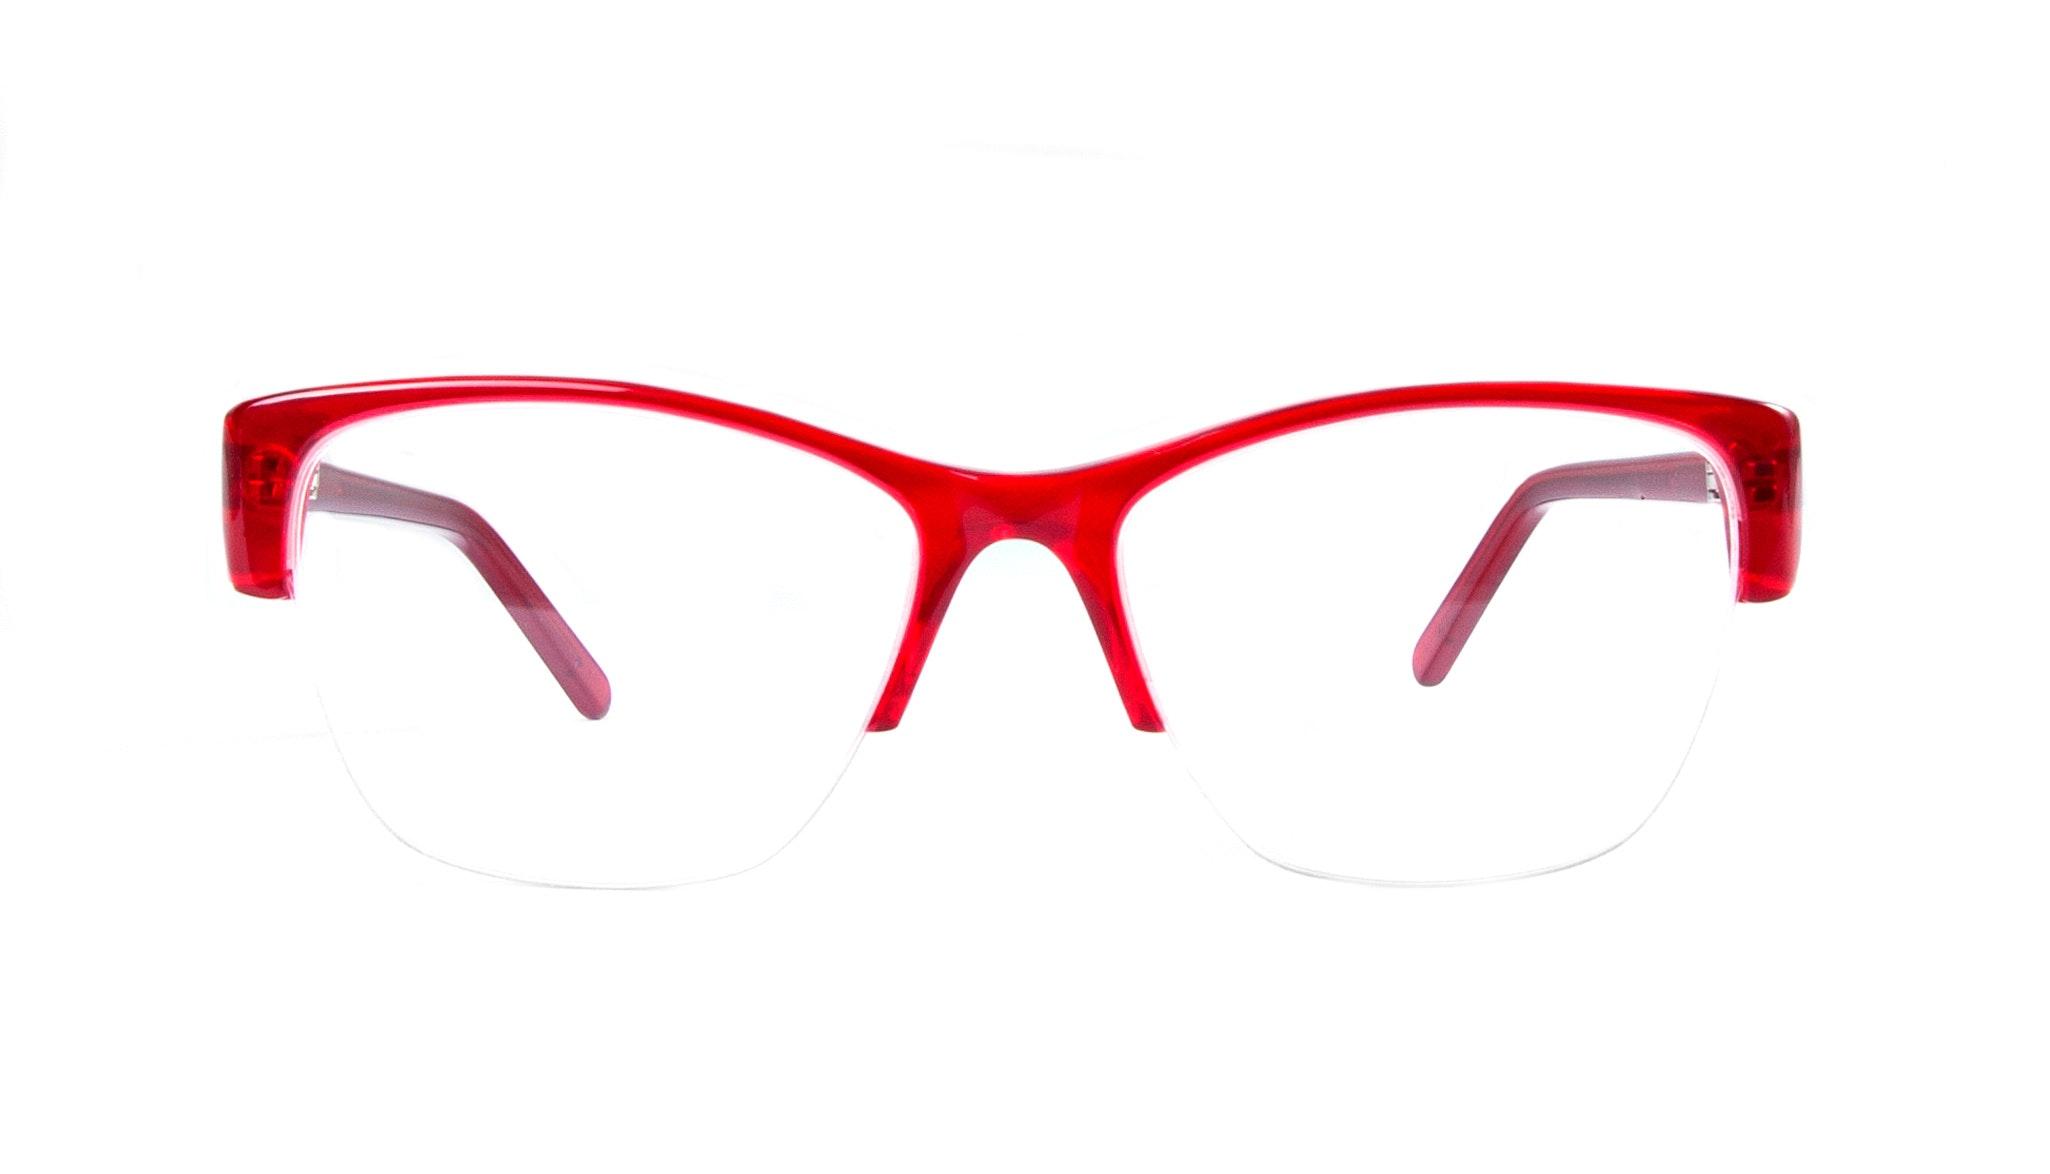 Affordable Fashion Glasses Cat Eye Semi-Rimless Eyeglasses Women Myrtle Light Rouge